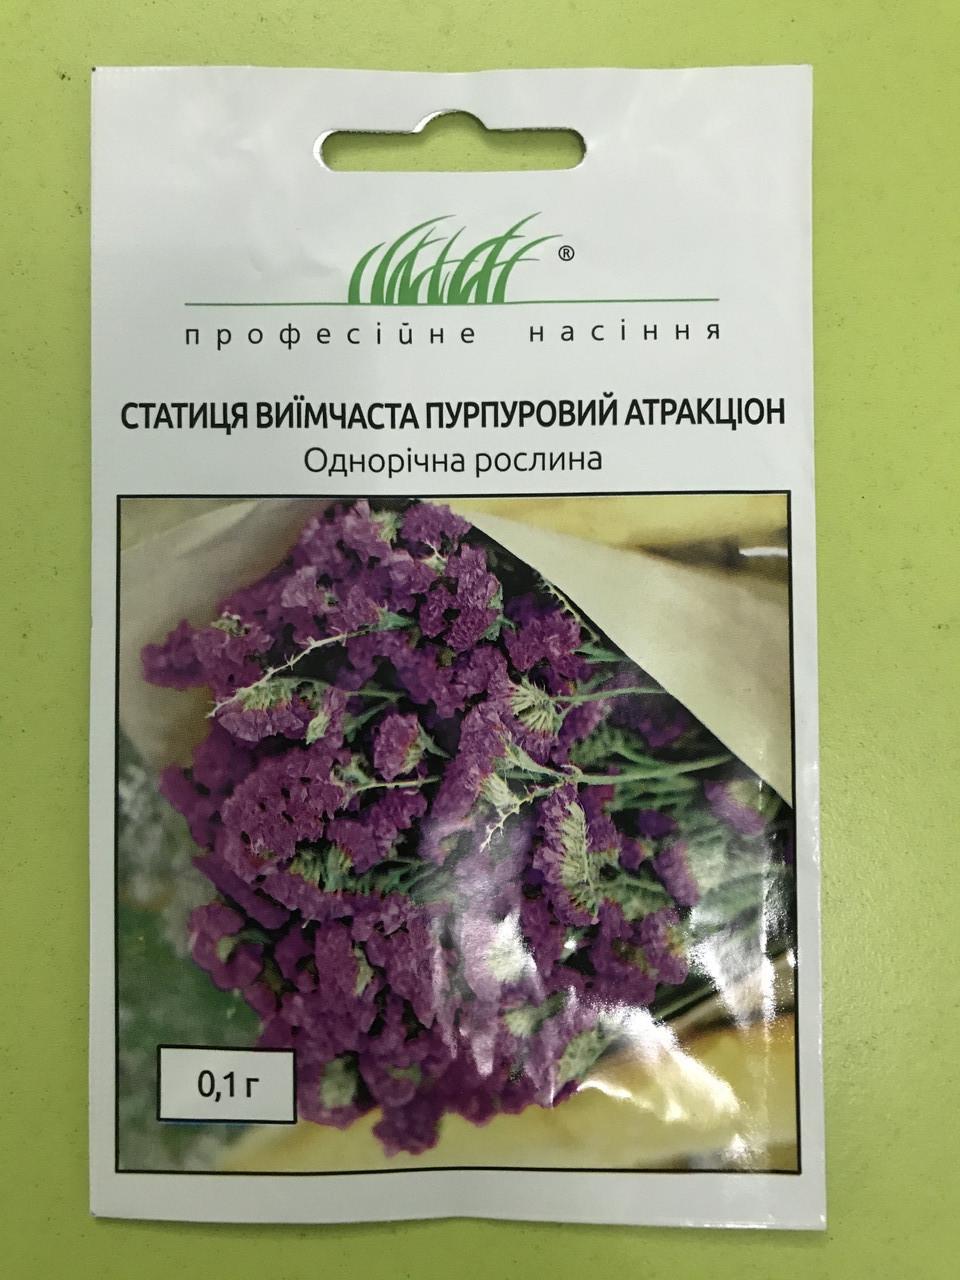 Семена цветов сорт Статица пурпурный атракцион 0,1 гр ПС